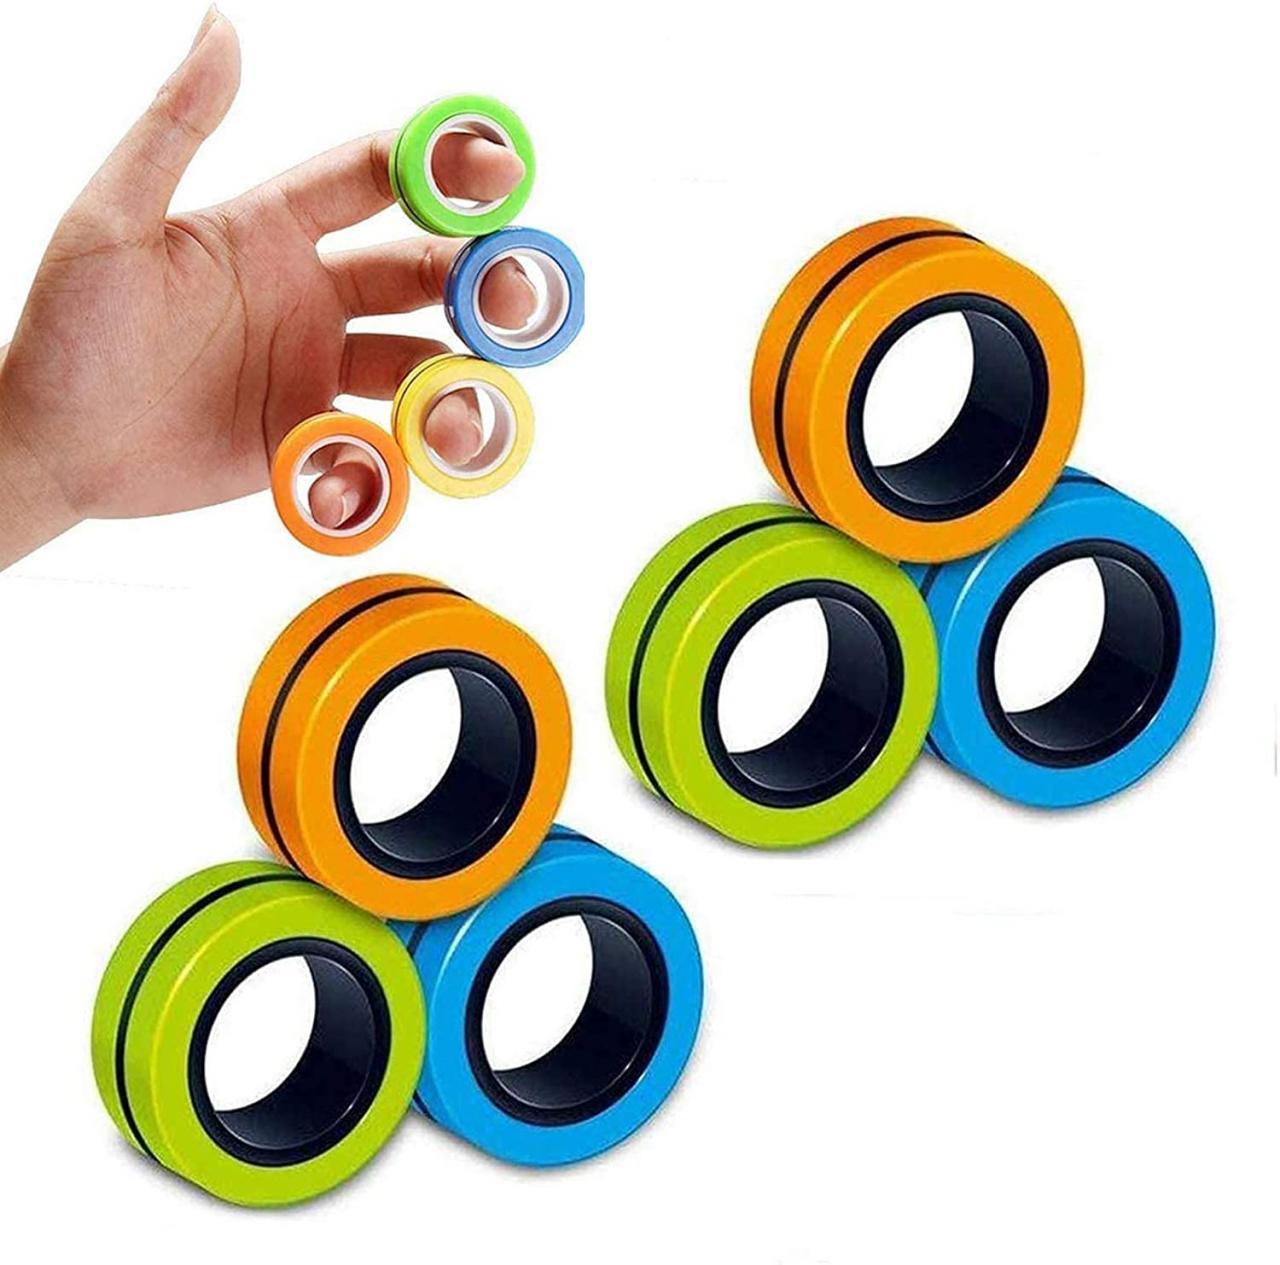 Hf2806007b2384f89a7ad9999ab450d55G - Ring Fidget Store